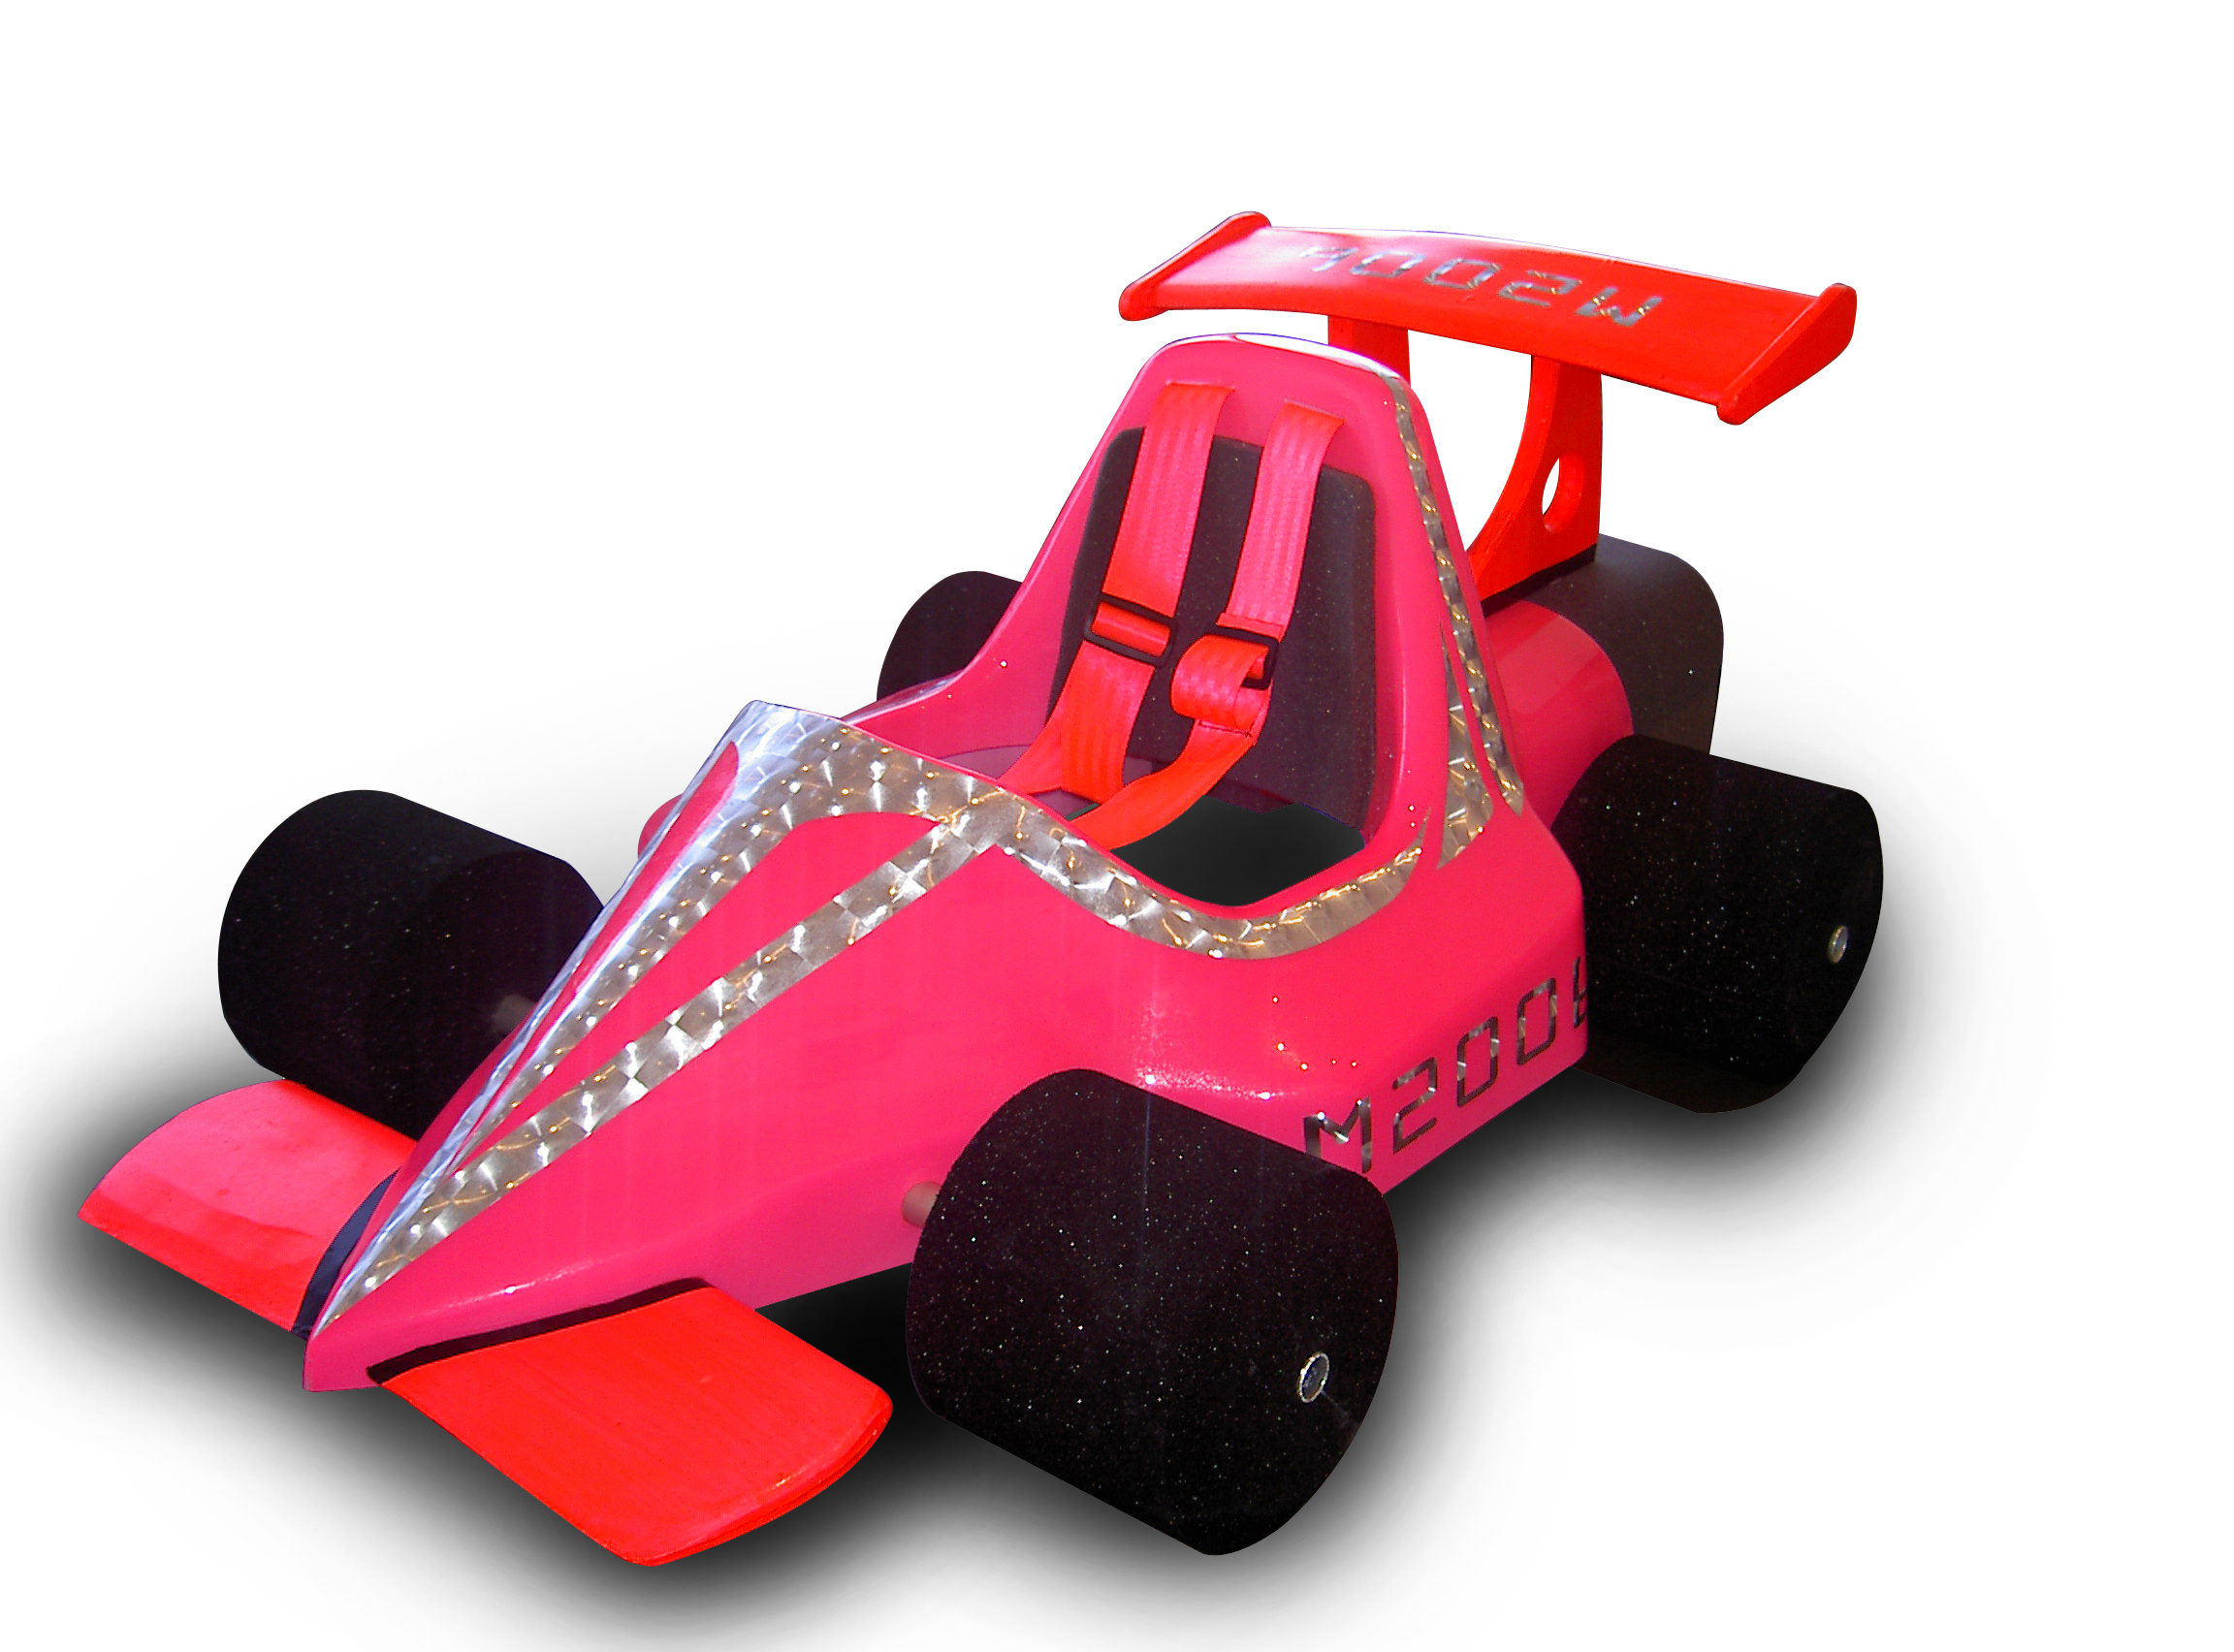 Commonwealth Games formula 1 car